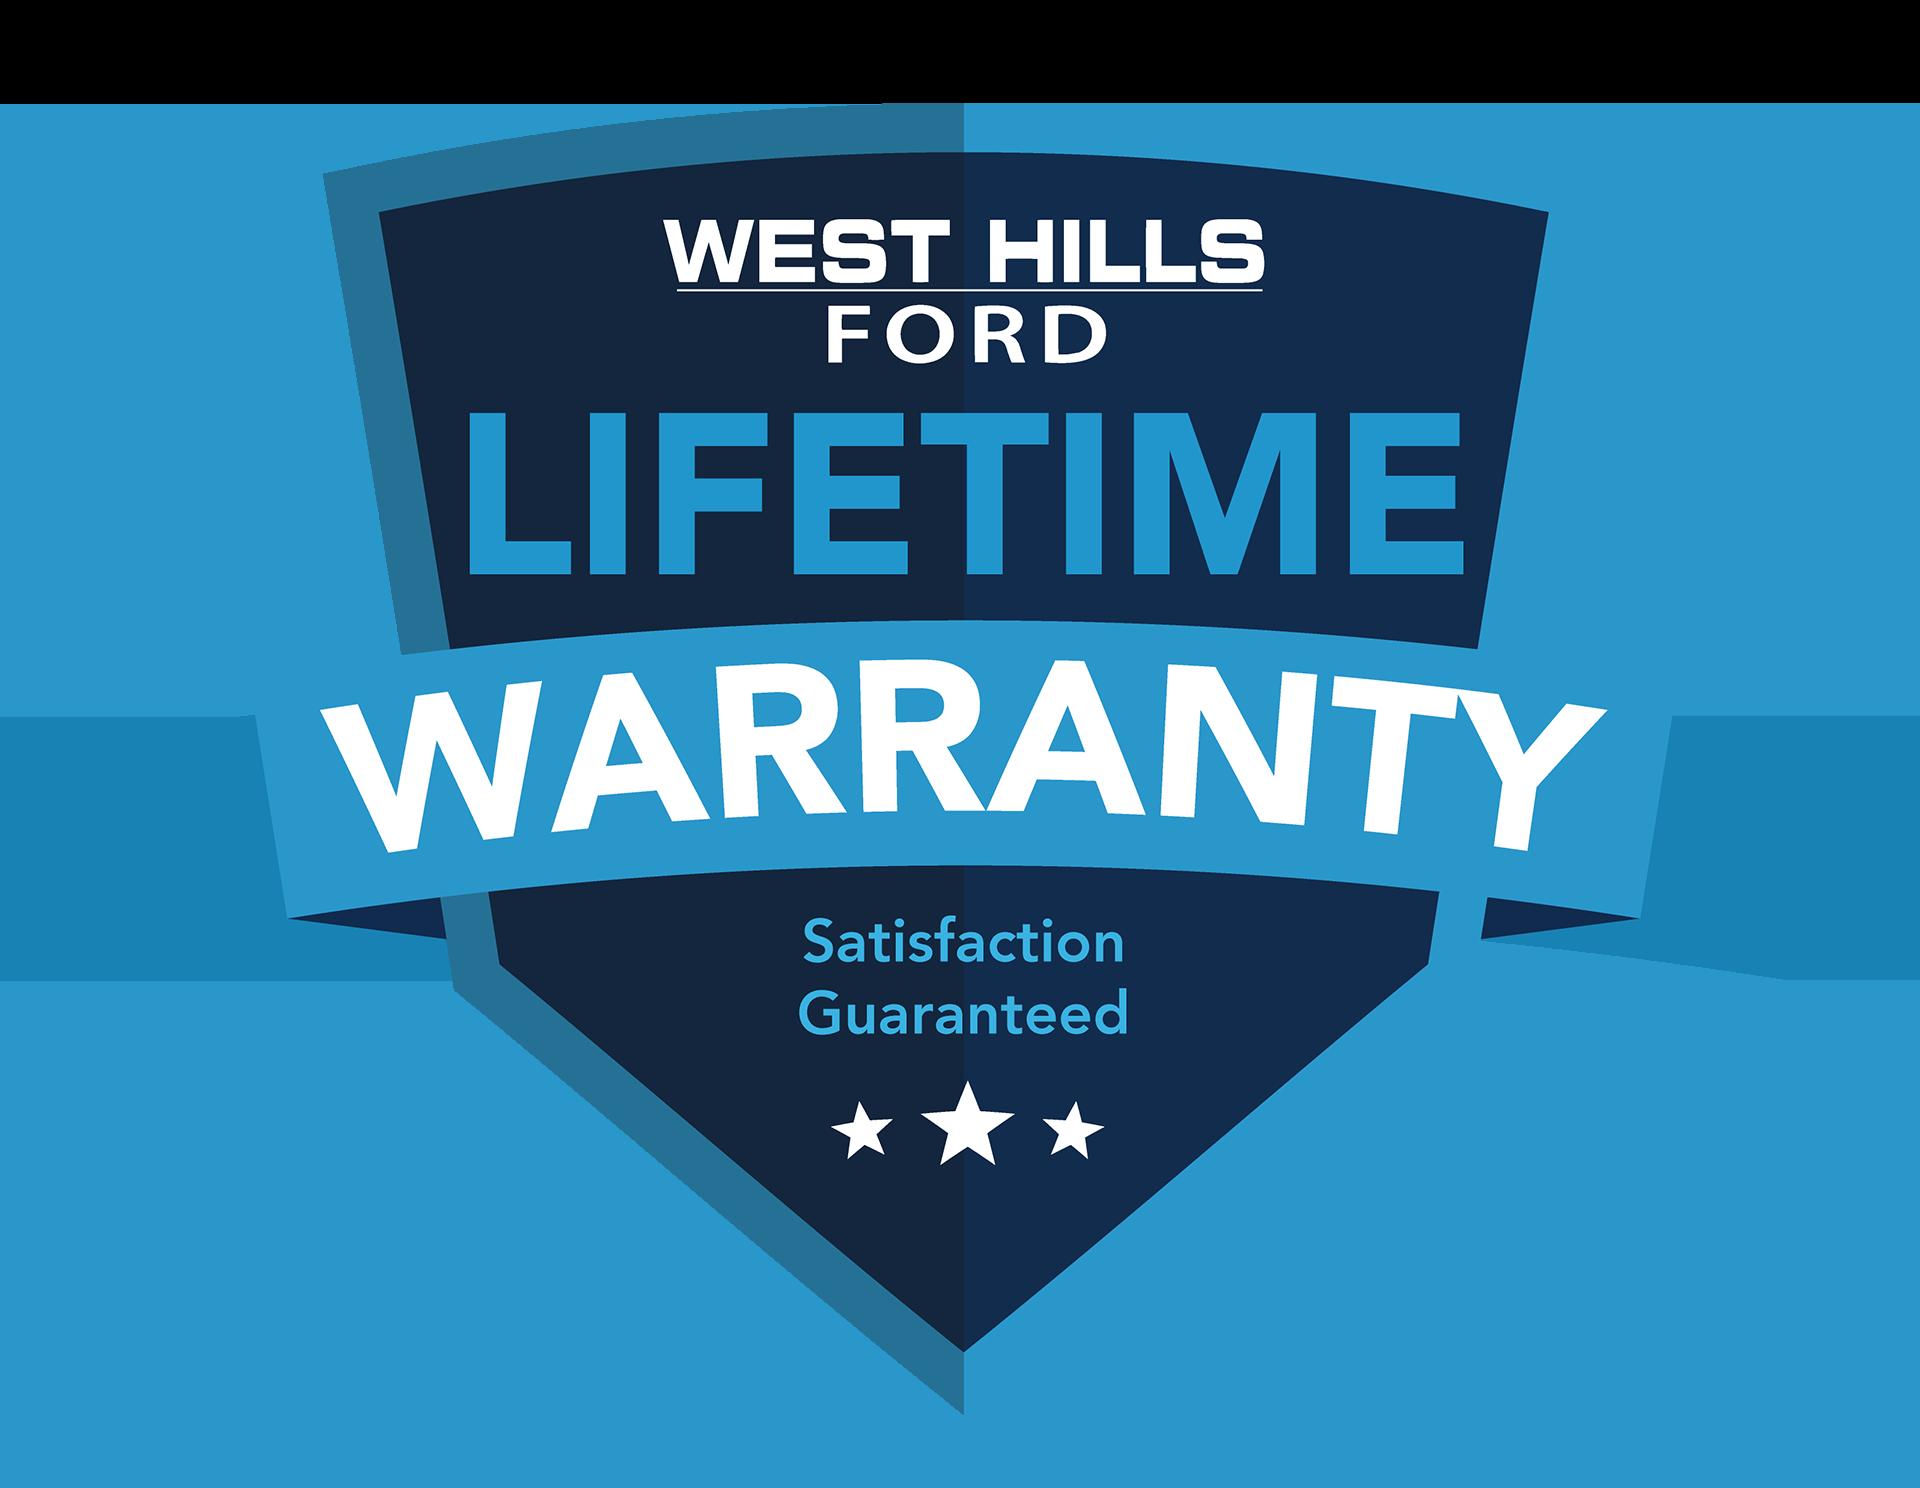 Lifetime Warranty West Hills Ford